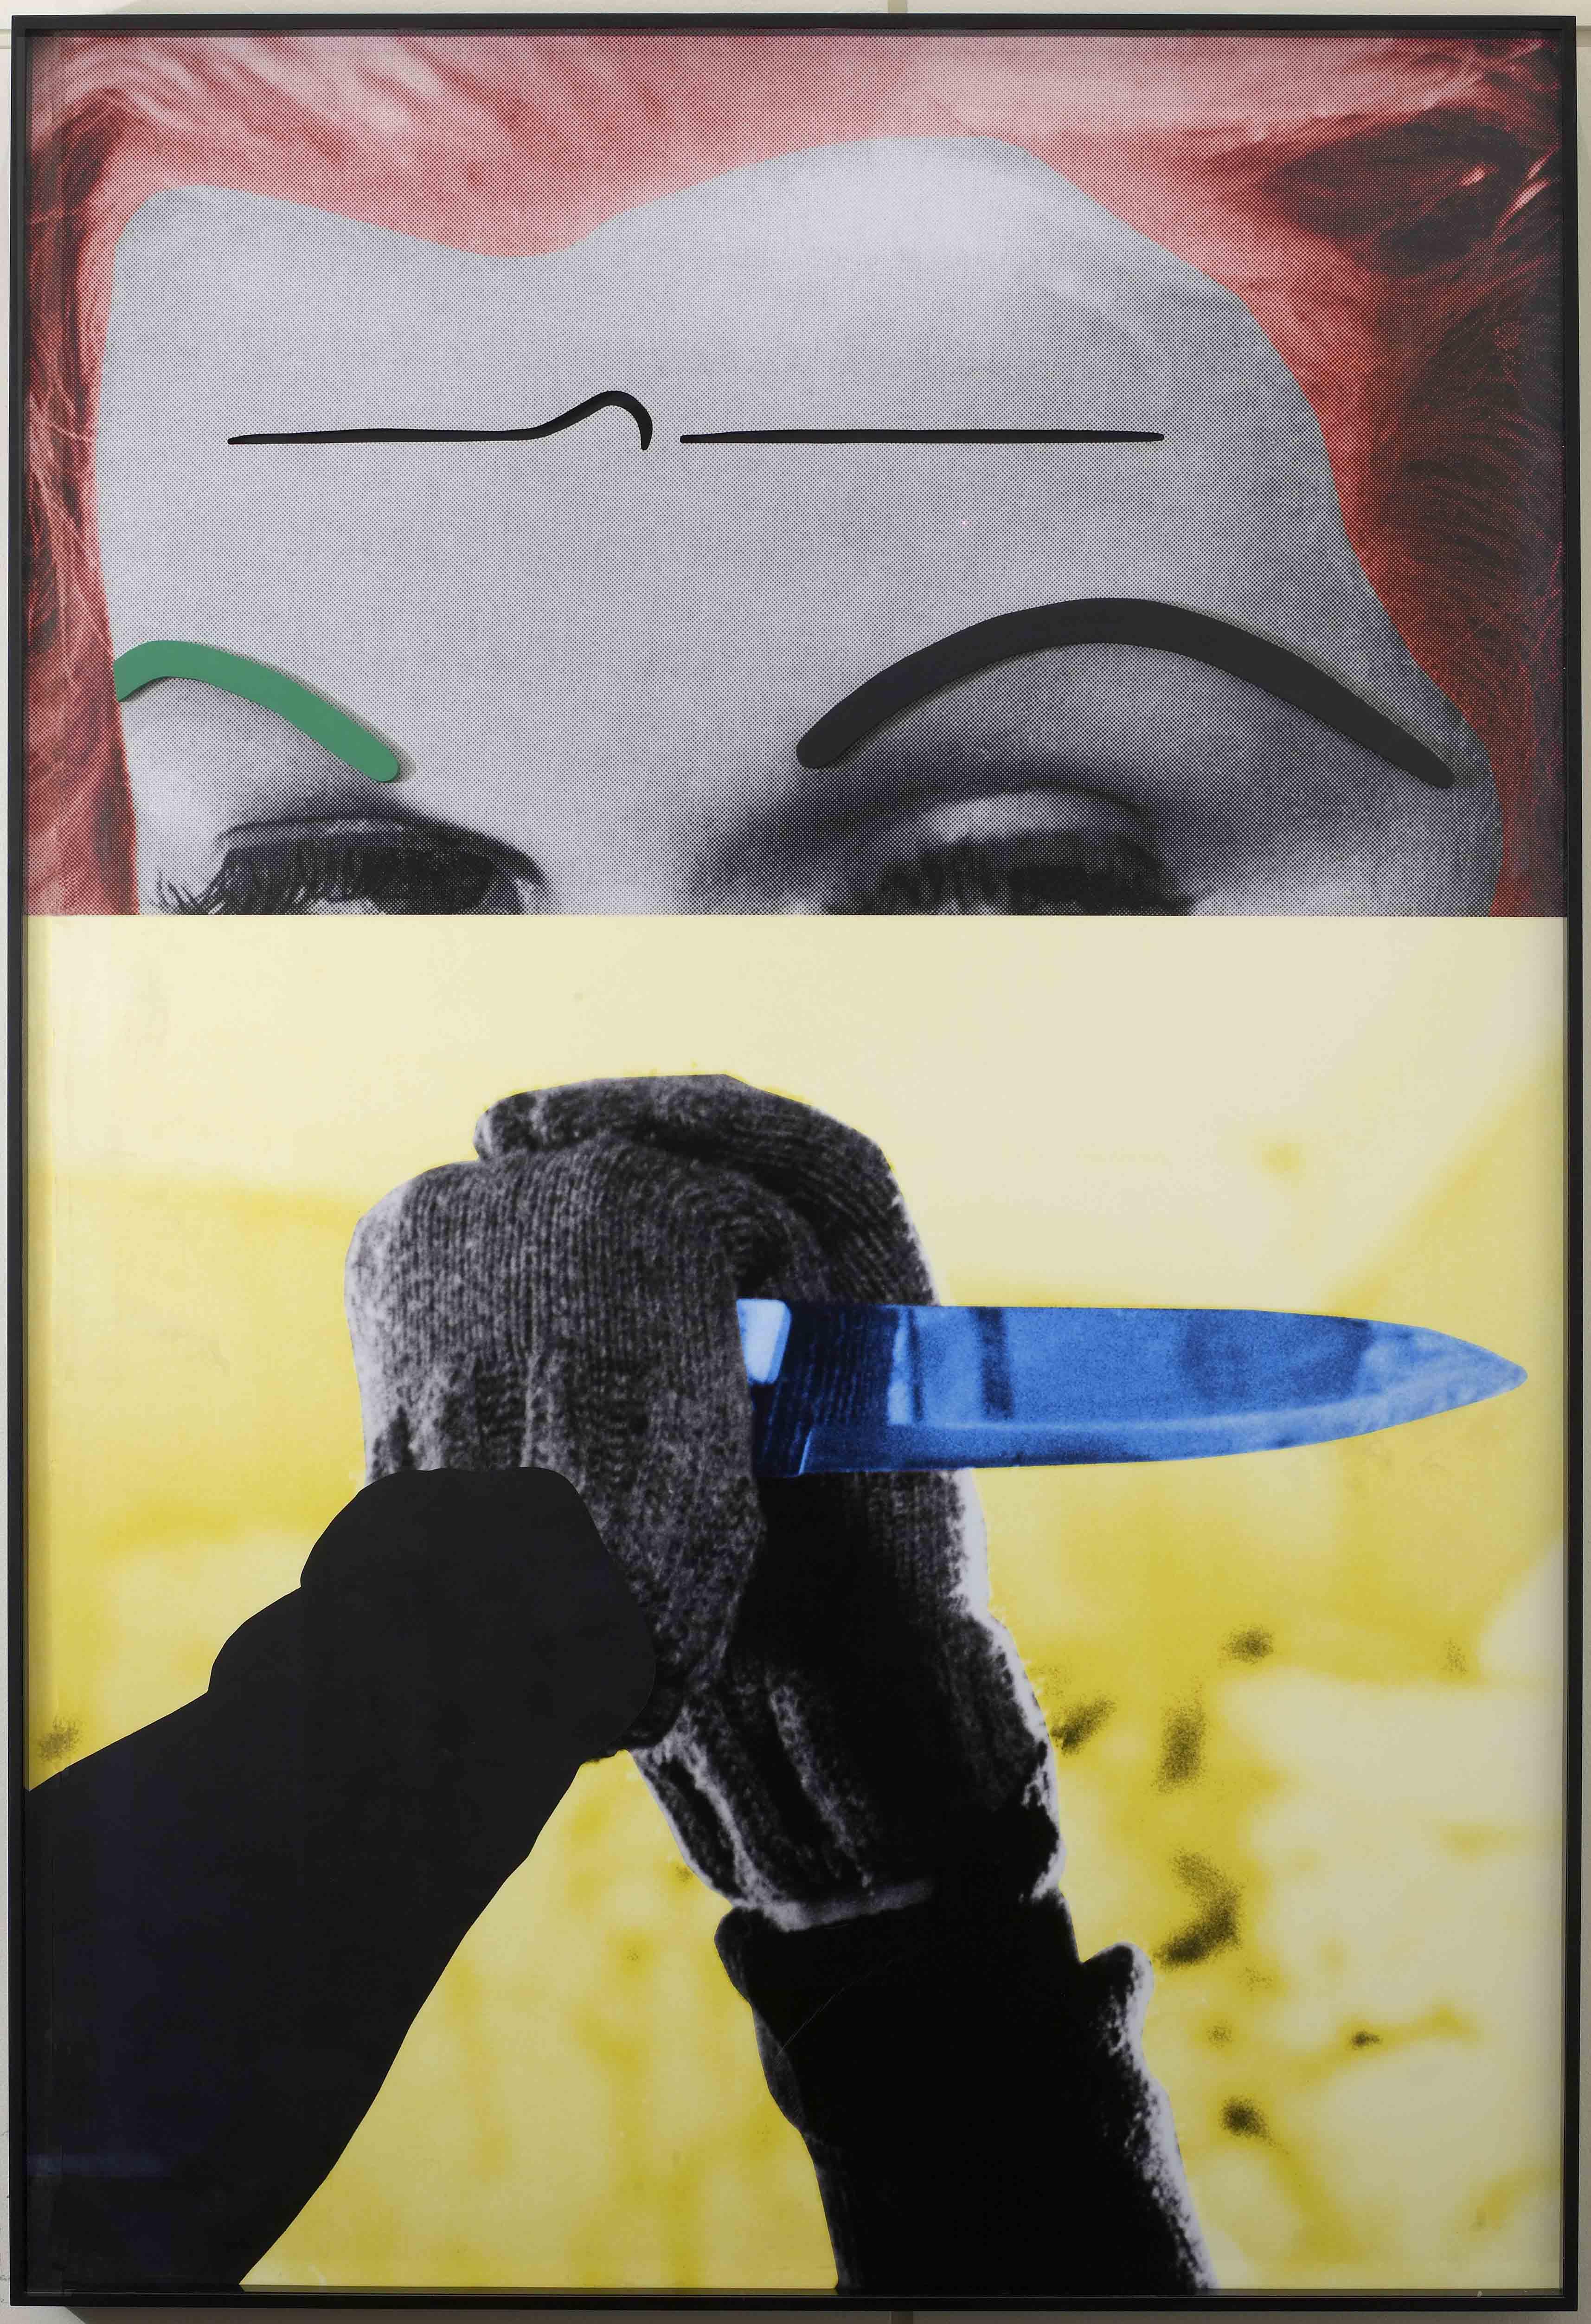 Raised Eyebrows Furrowed Foreheads Knife (With Hands), John Baldessari  (2009)